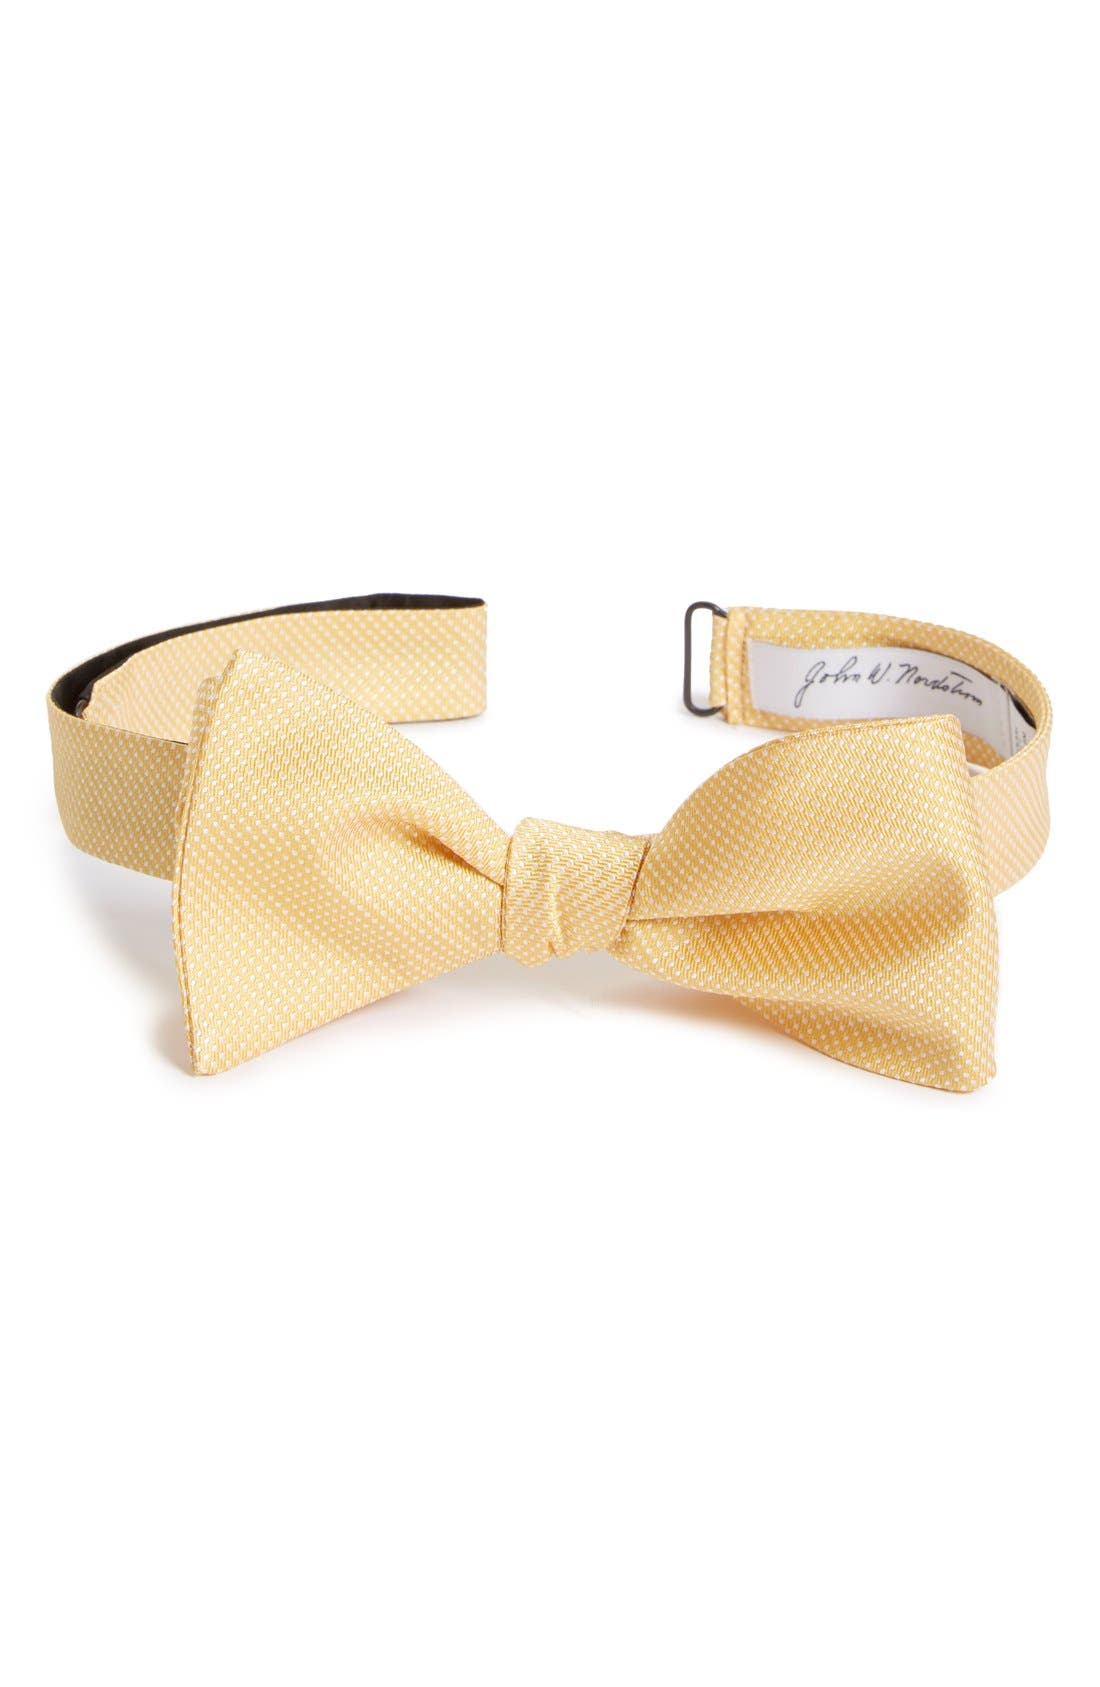 Dot Silk Bow Tie,                             Main thumbnail 1, color,                             700